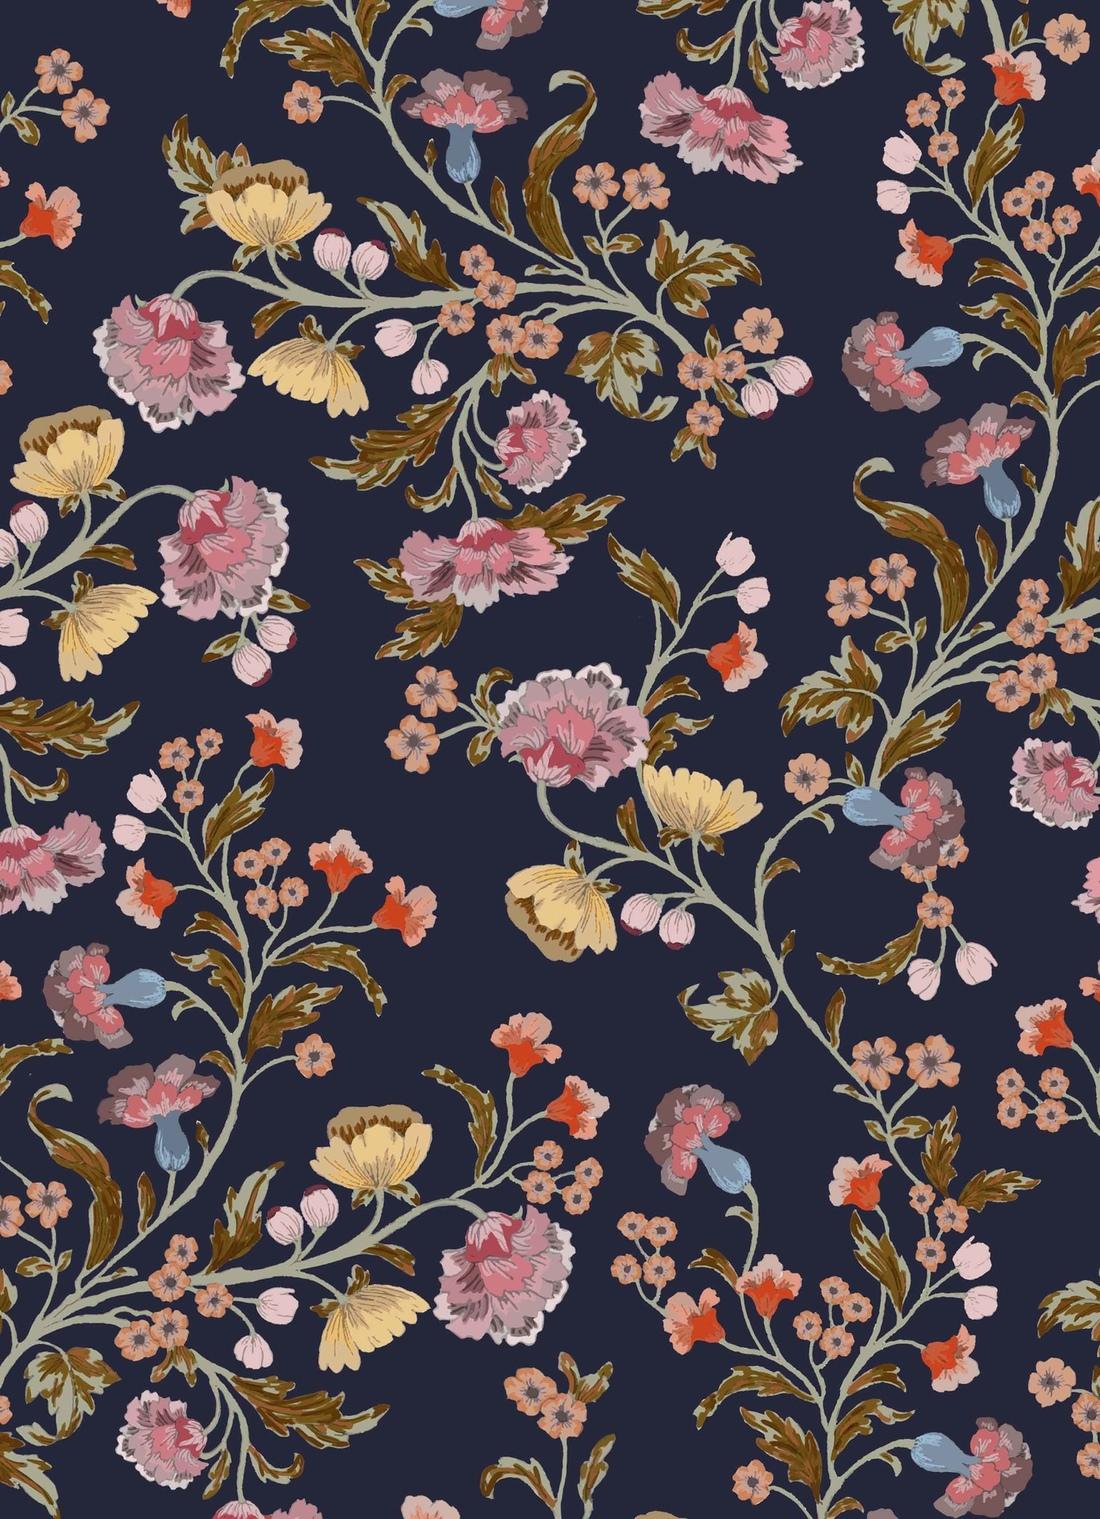 Katie Lane - Florals A/W